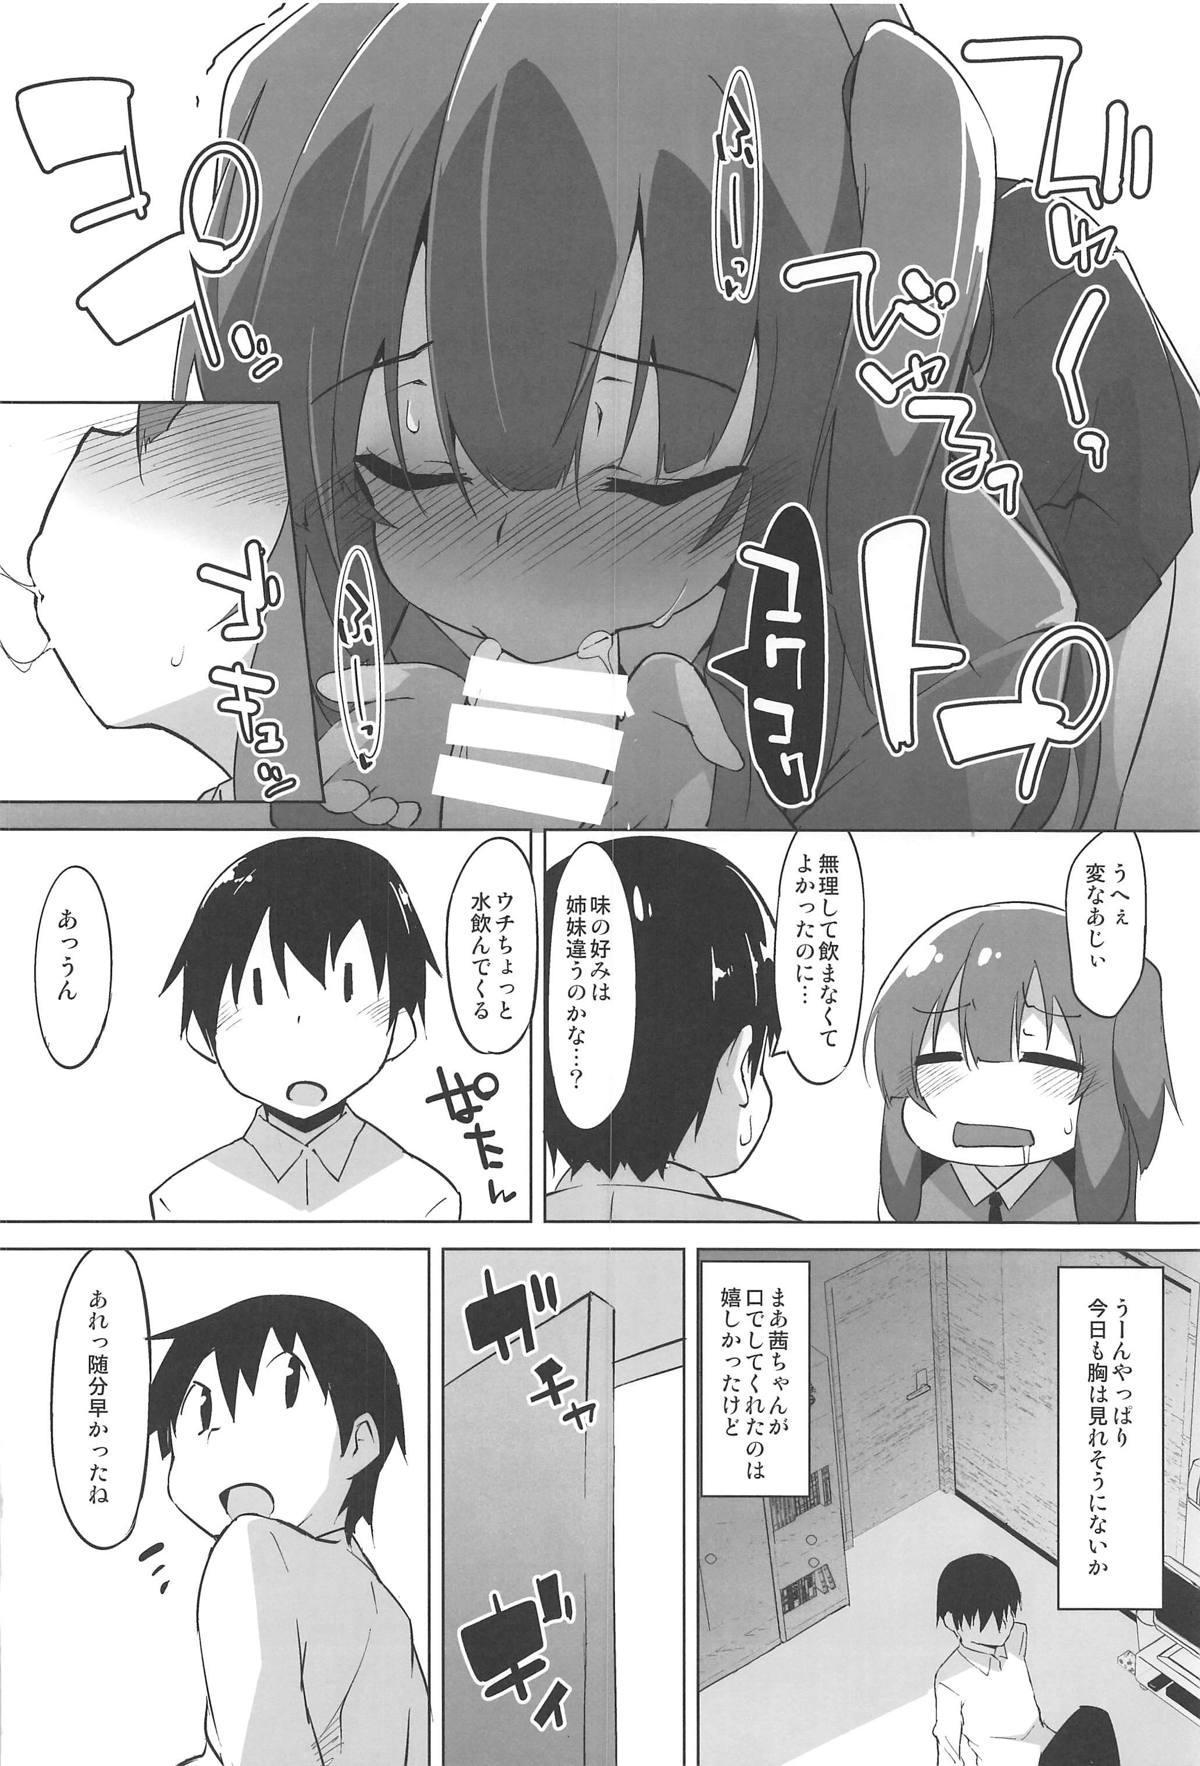 Himegoto Shimai 12